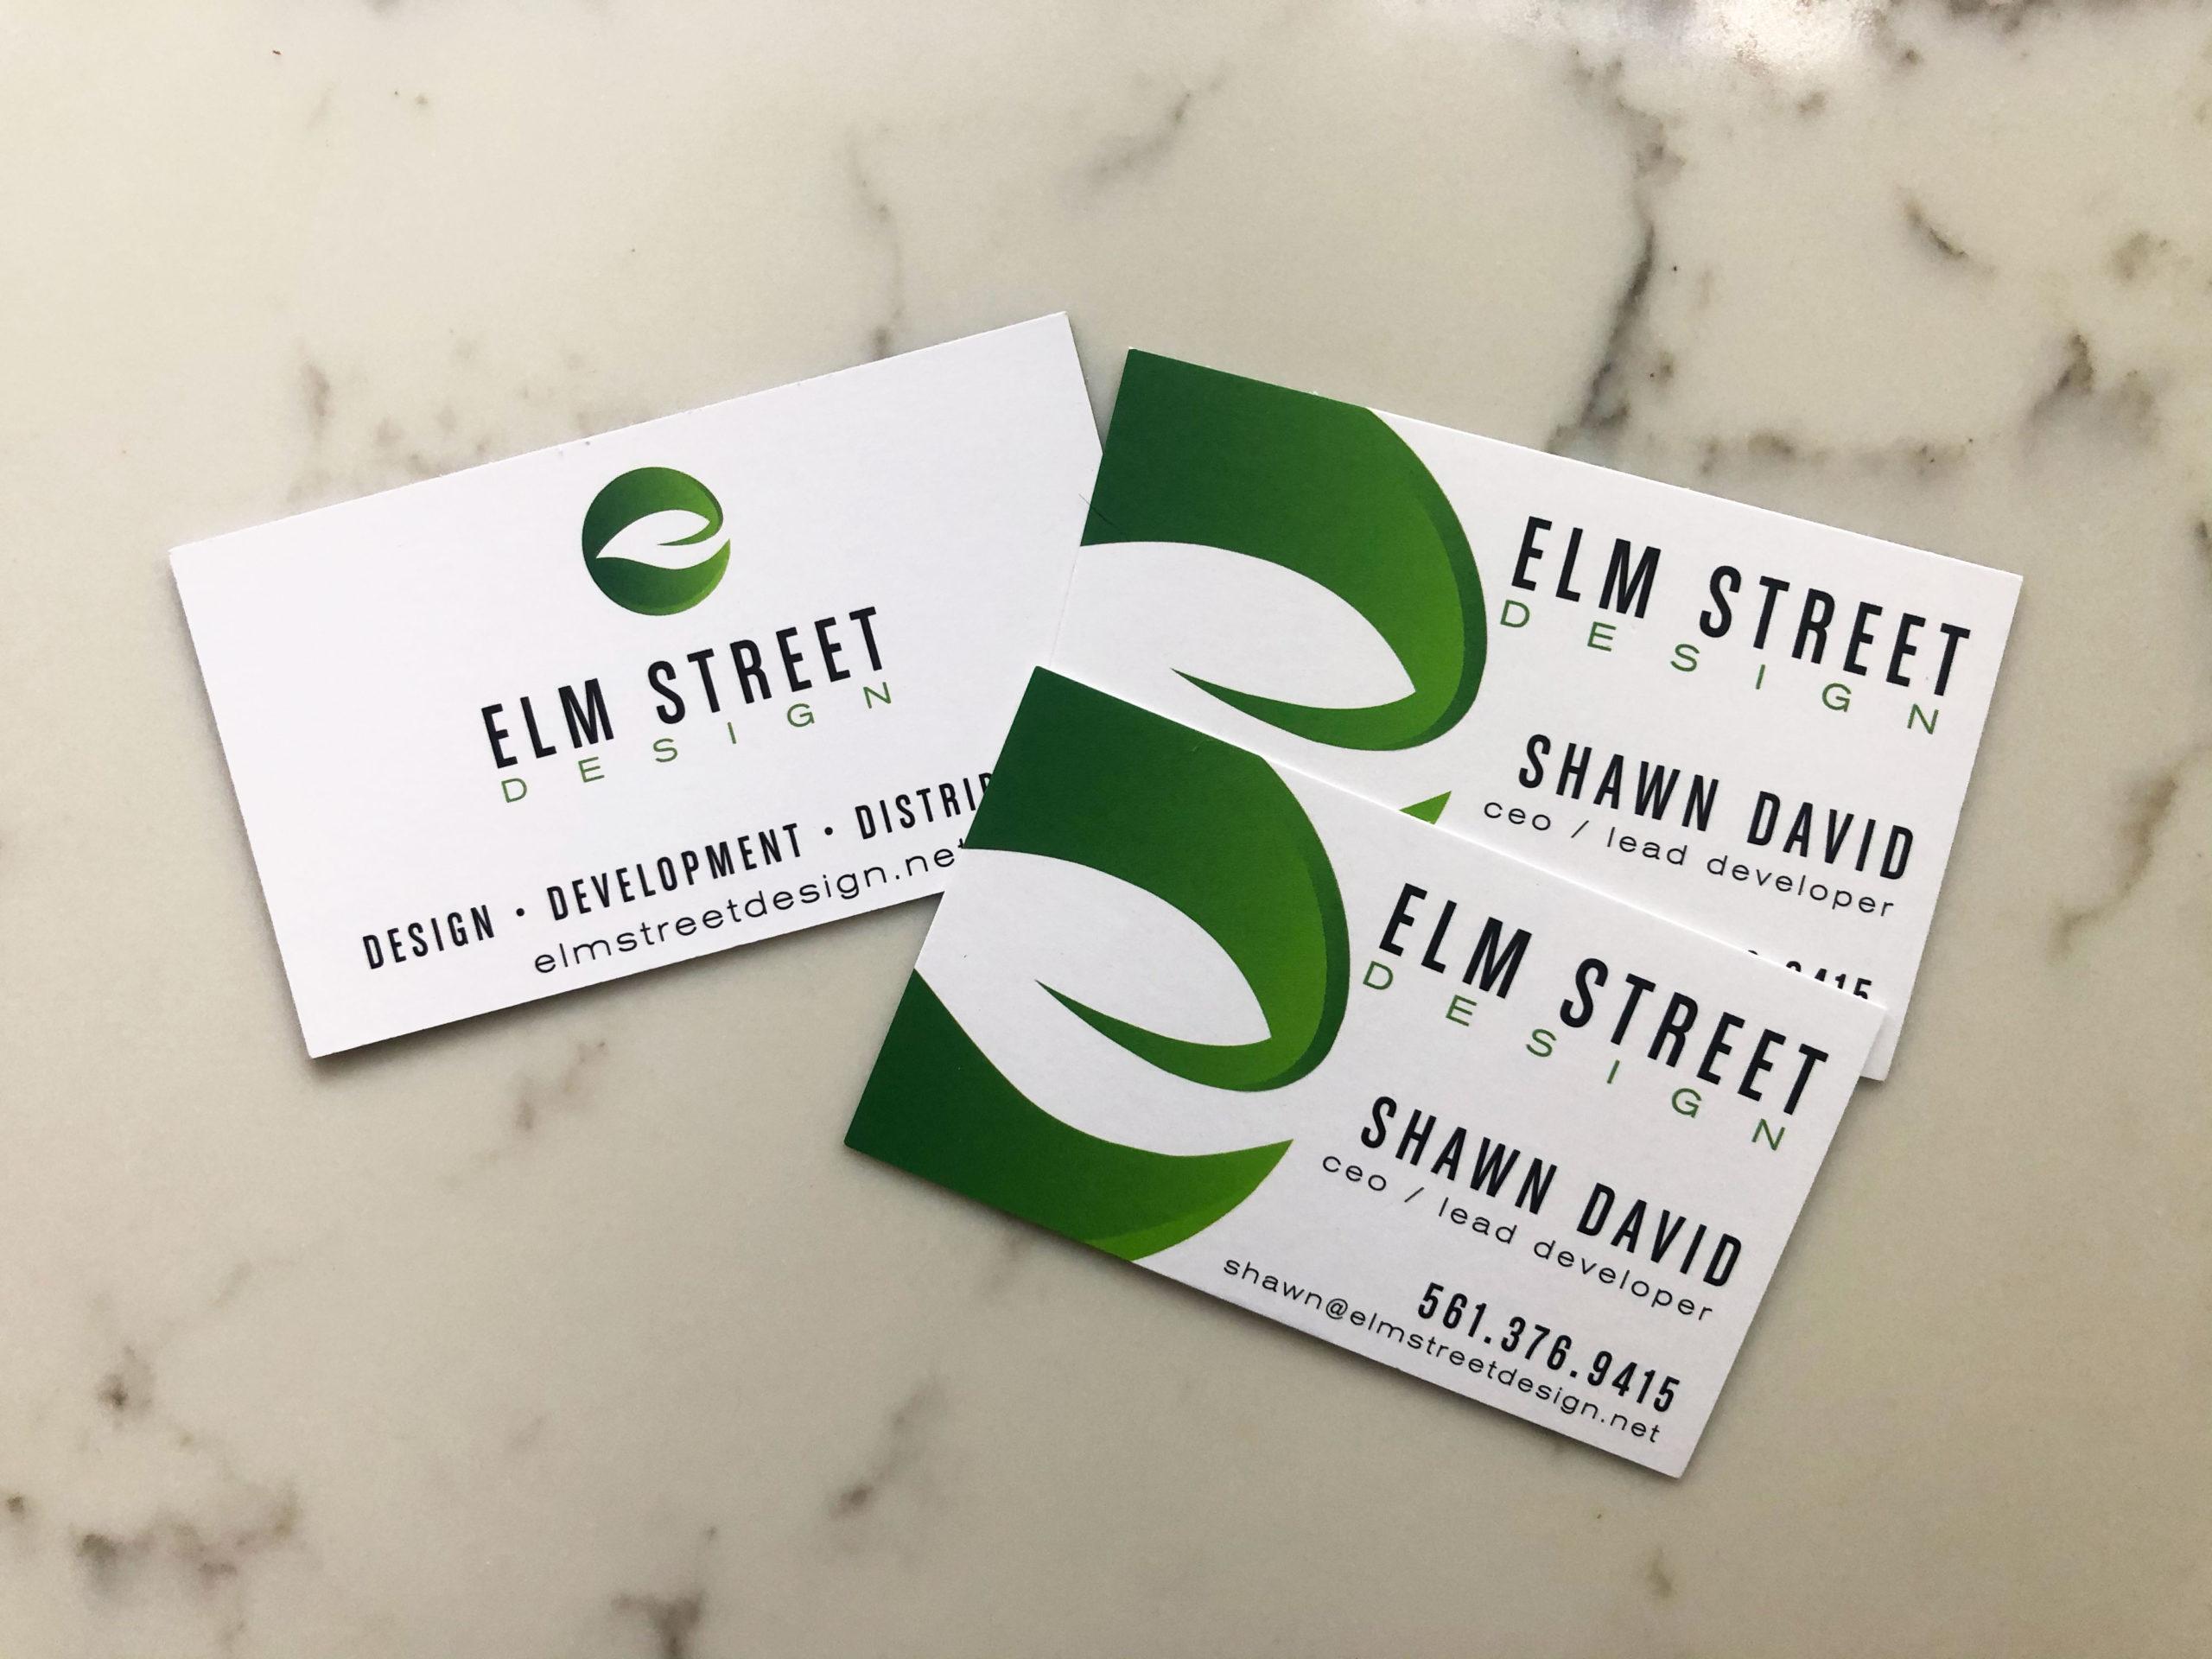 Nicole-David-Elmstreet-card-scaled